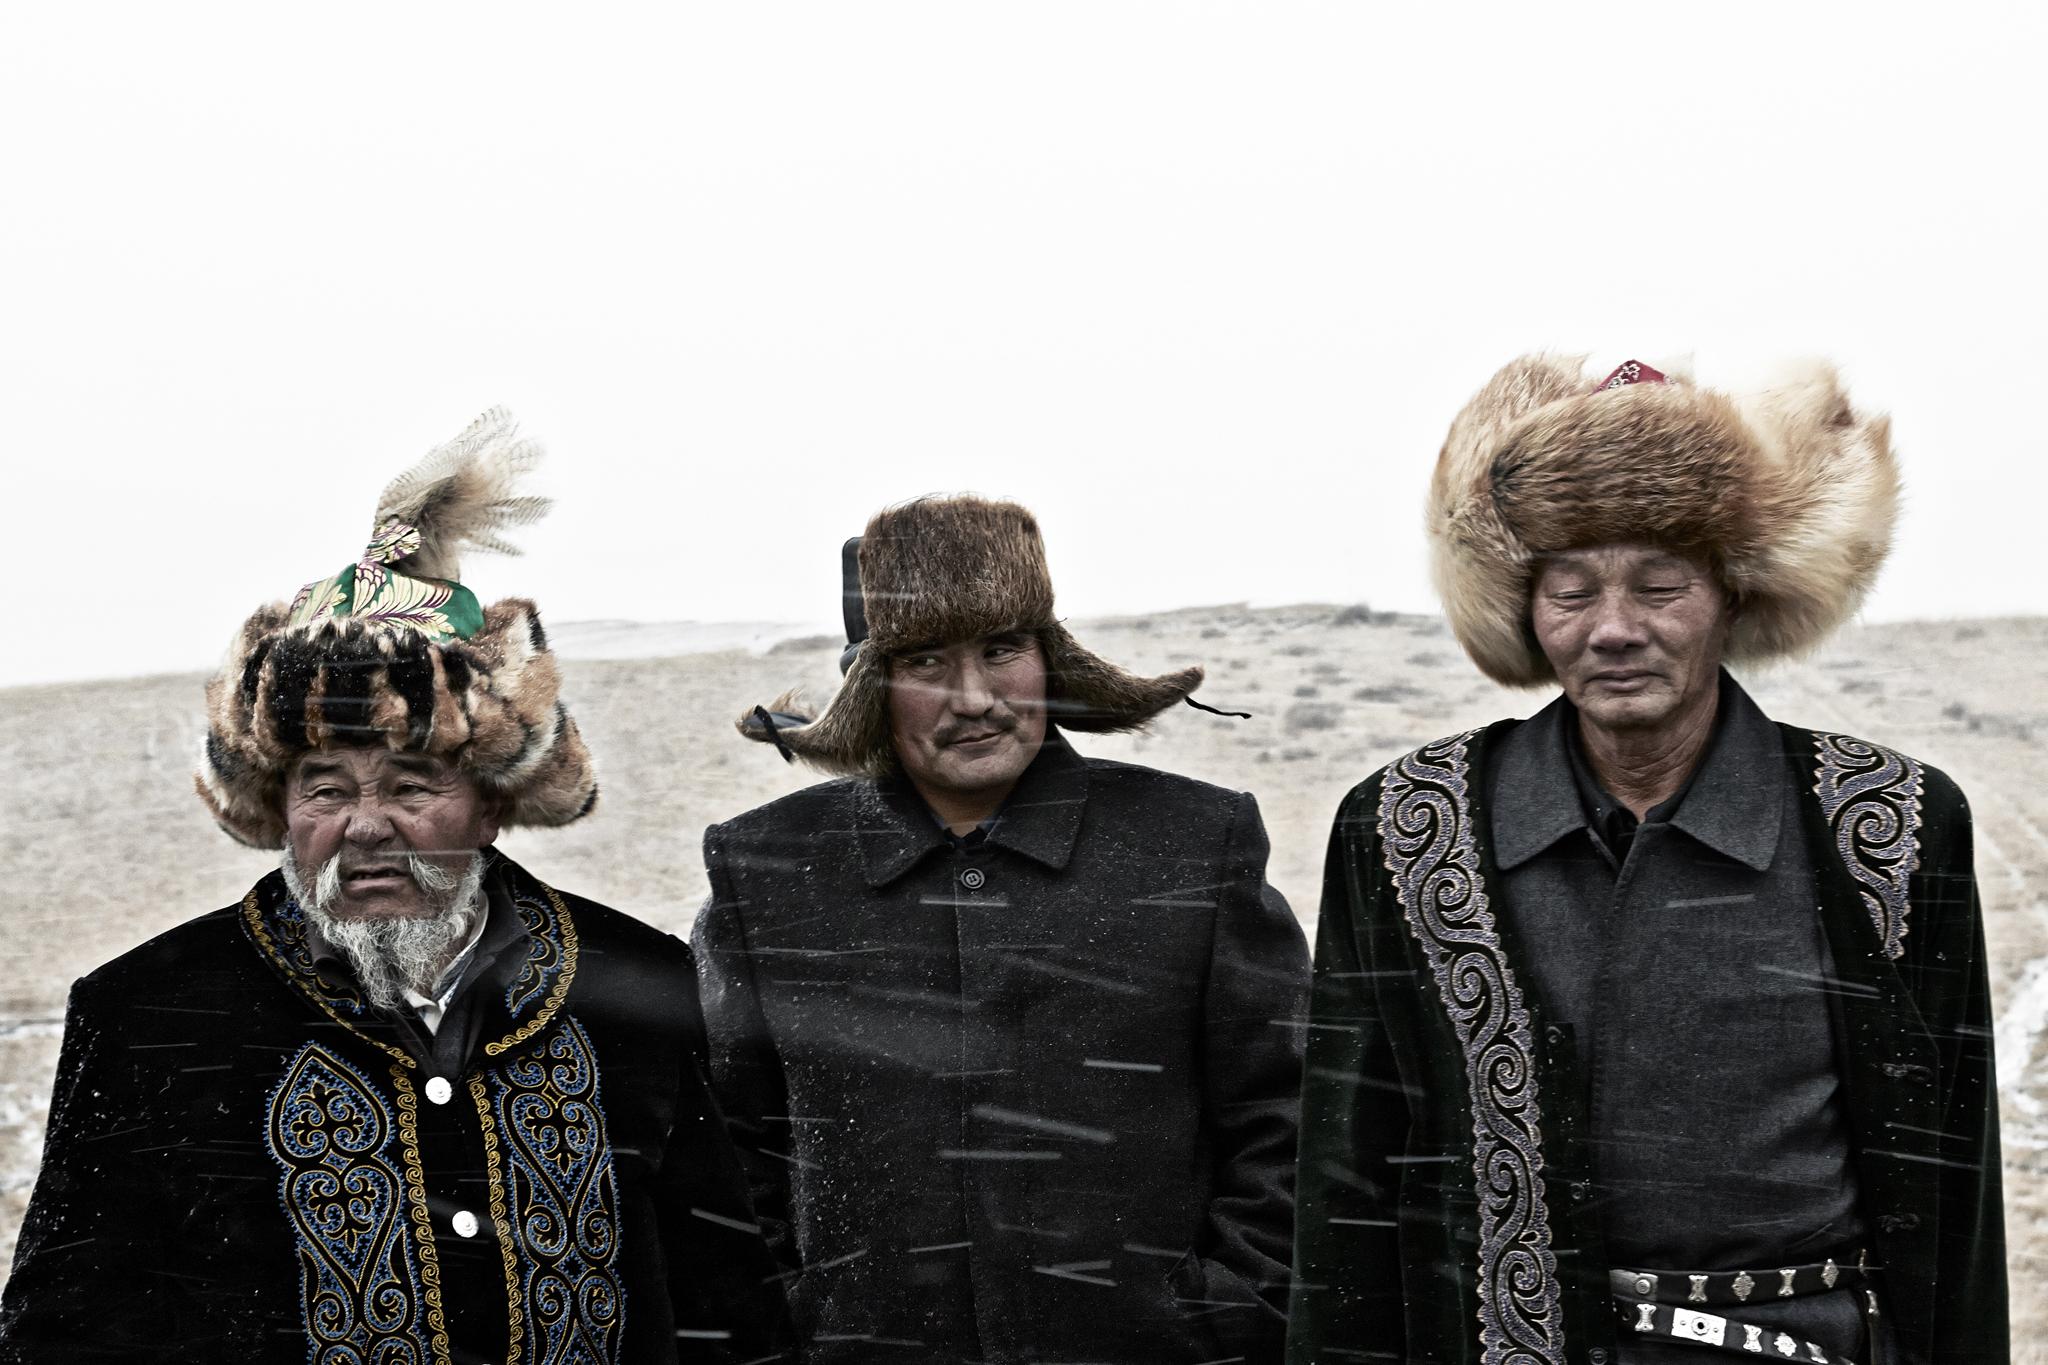 journey02_Kazakhstan25